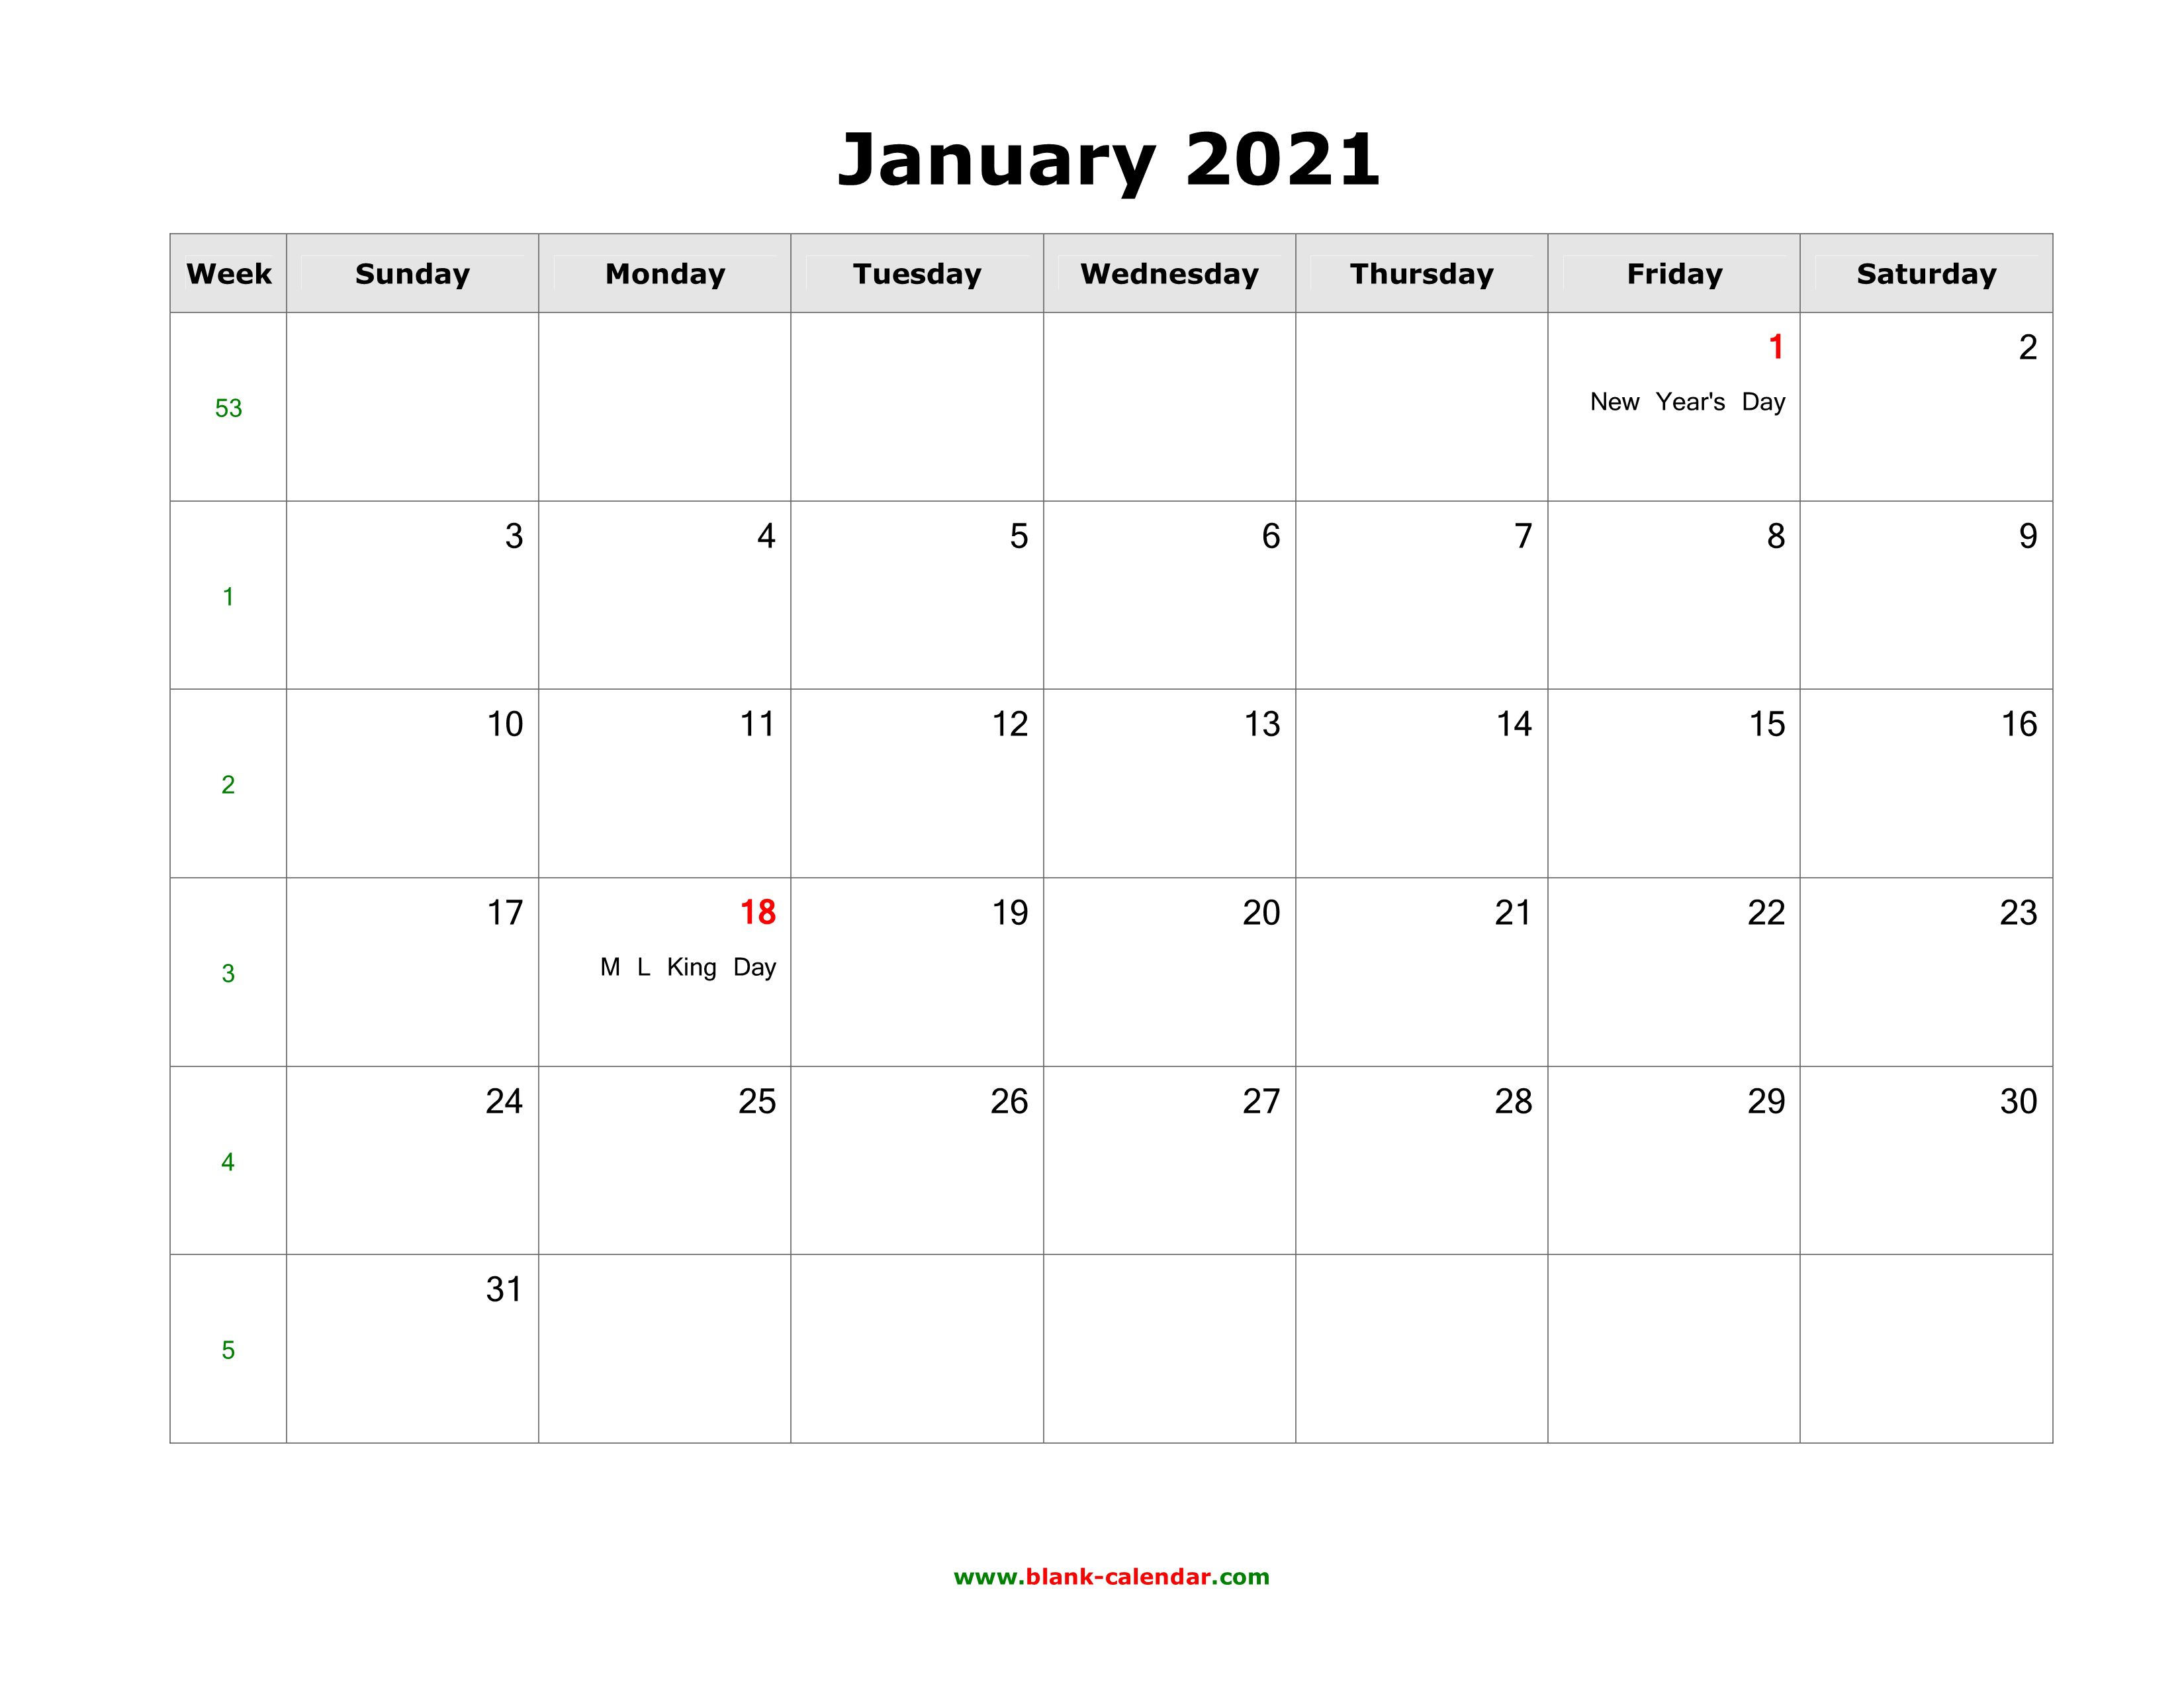 005 Unbelievable Editable Calendar Google Doc 2021 High Def Full